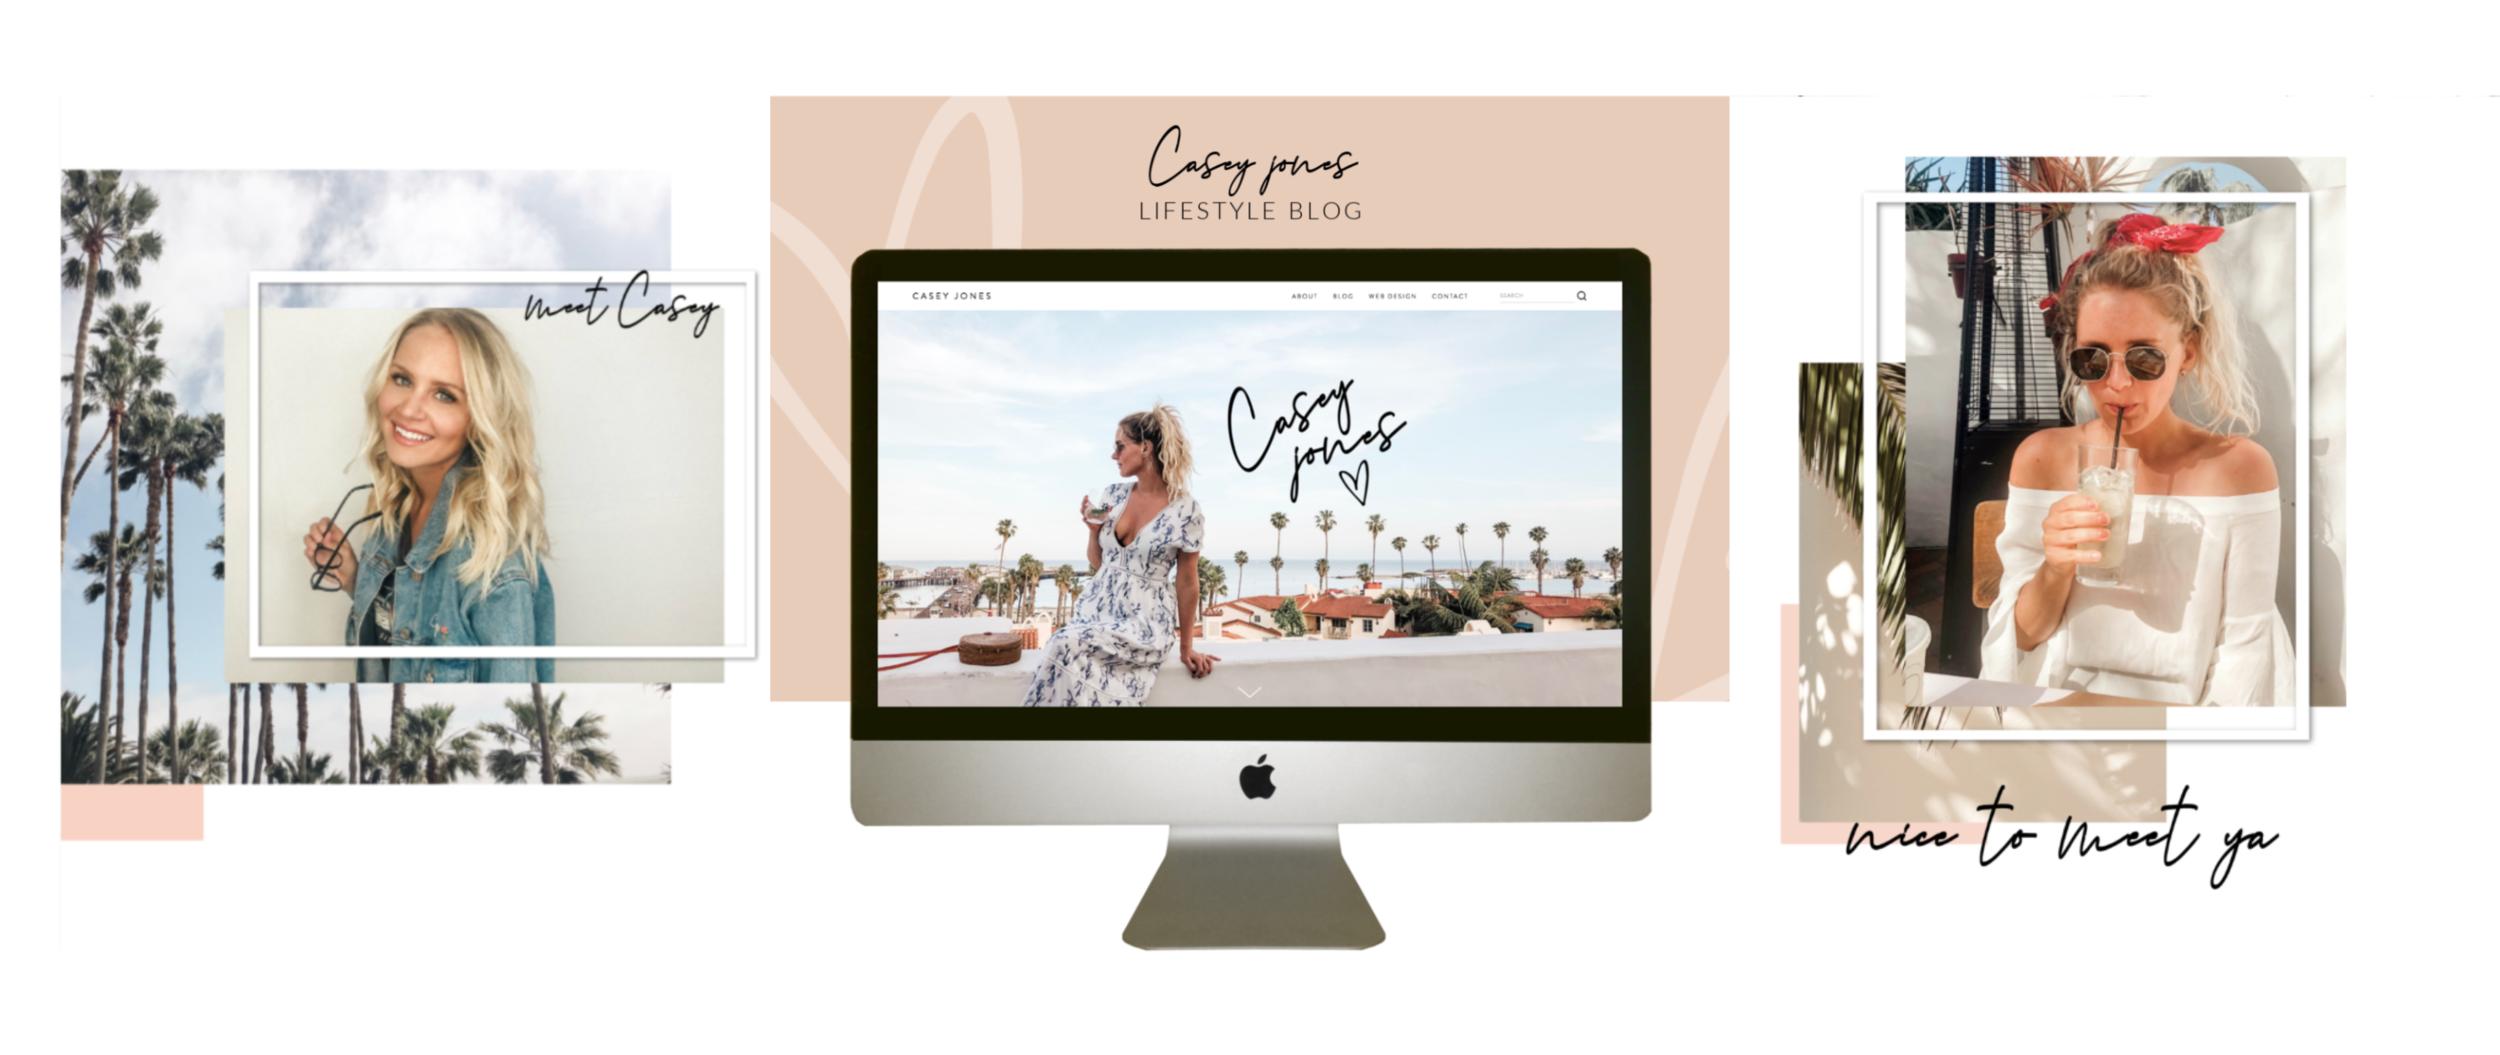 lifestyle blogger custom squarespace design casey jones